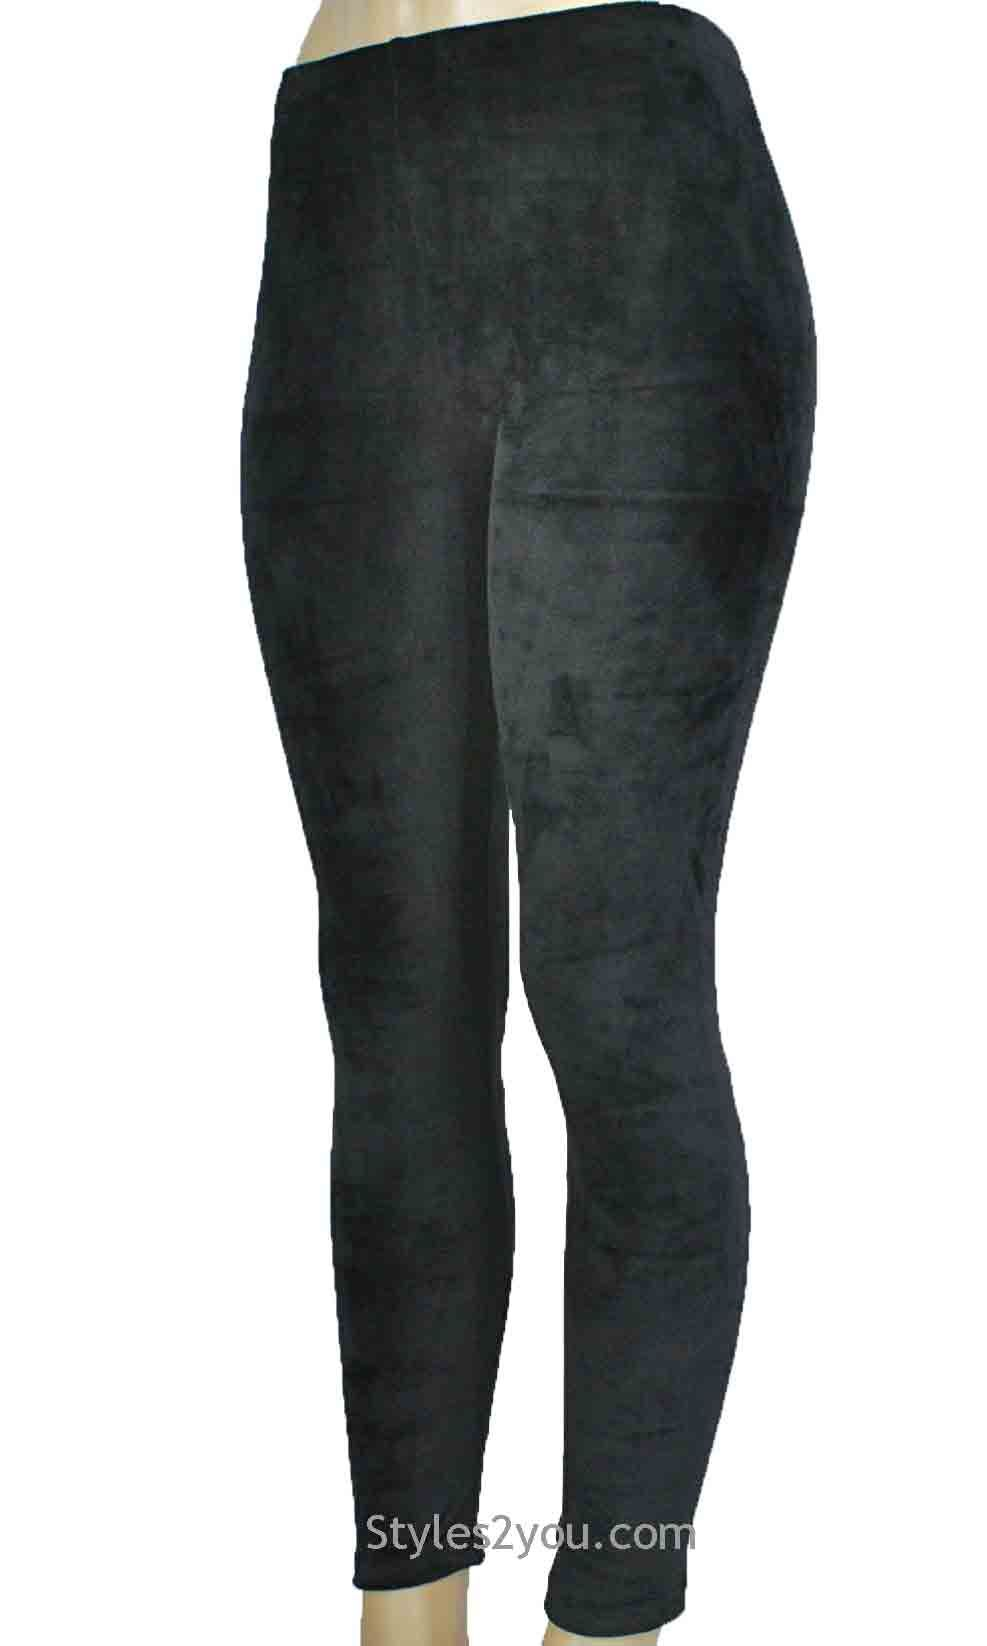 dd7e92b65cfe1 Regina Crushed Velvet Legging In Black #Vintage, #victorian, #unique,  #lace, #boutique, #vintageinspired, #styles2you #love #collection #ideas  #inspiration ...